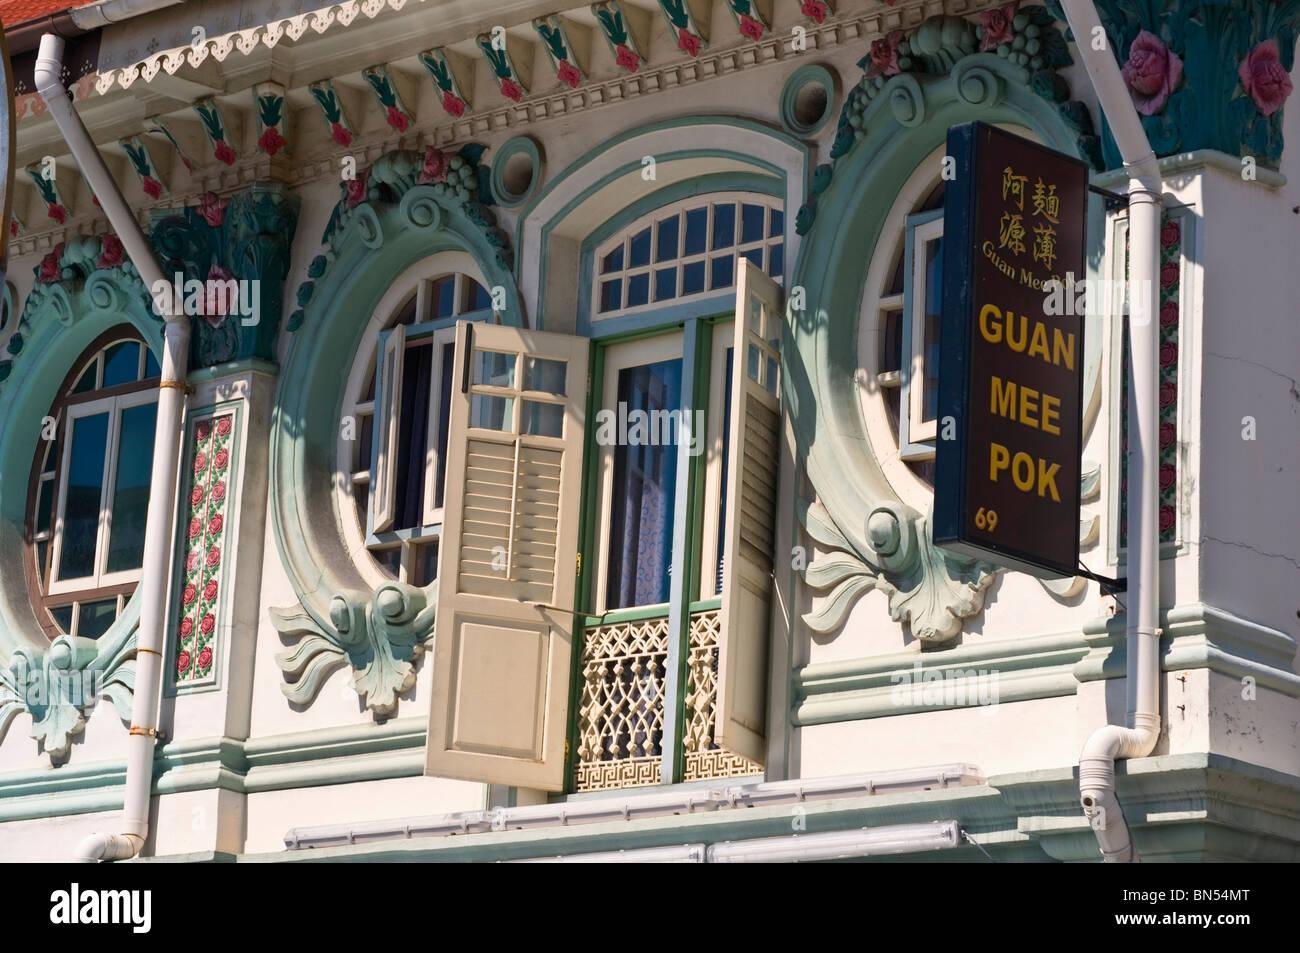 Traditional shophouses Chinatown Singapore - Stock Image